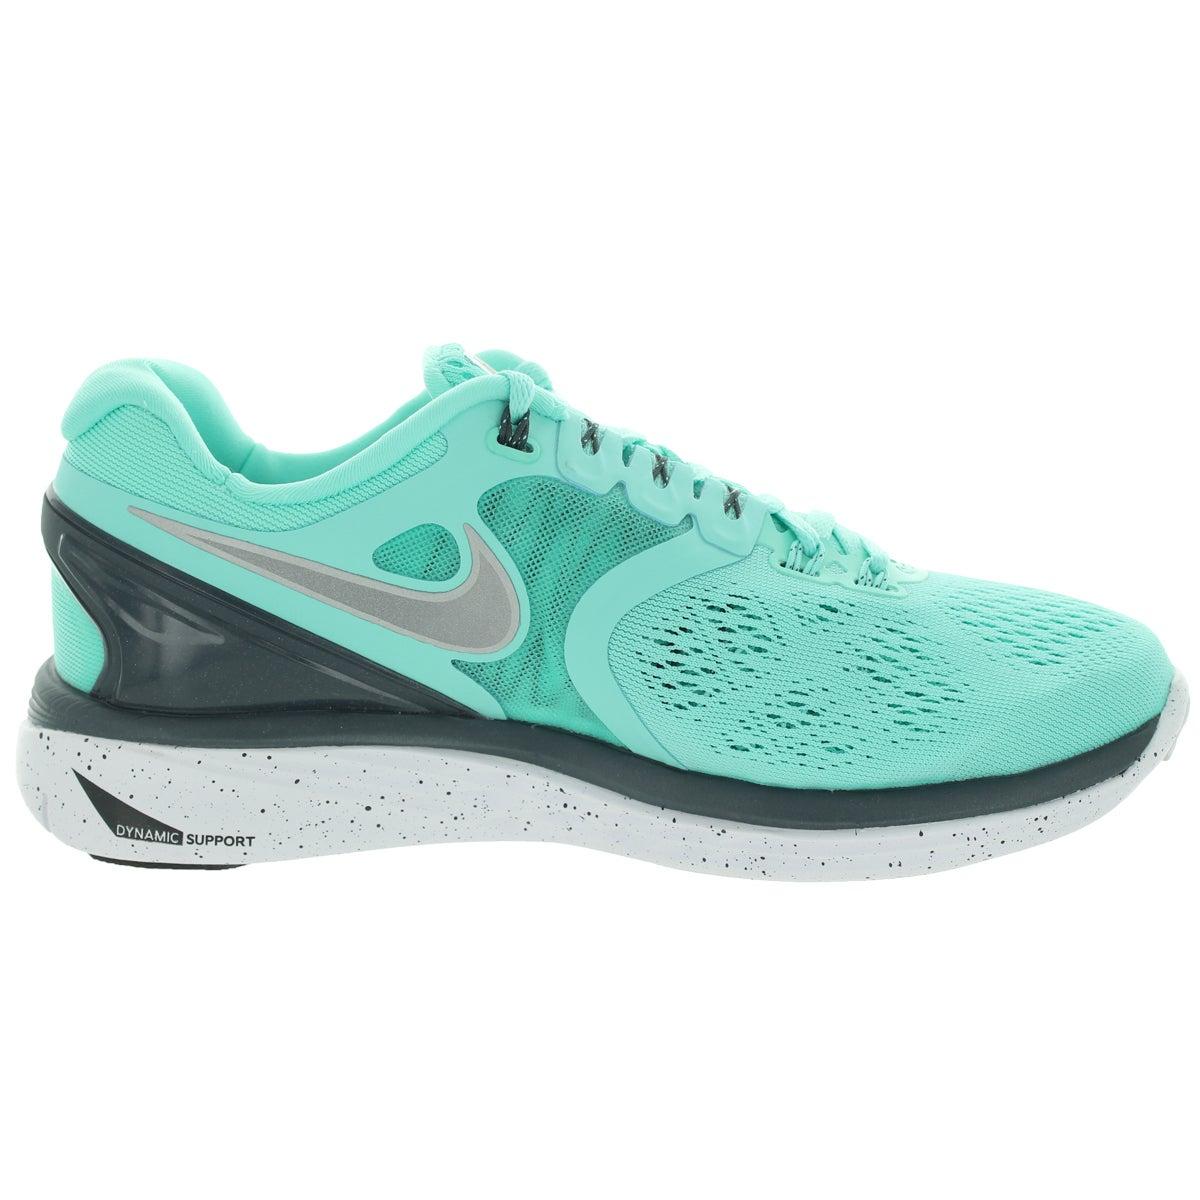 cheap for discount cb7a0 4fda3 ... greece shop nike womens lunareclipse 4 tqr rflct slvr magenta gr  running shoe free shipping today